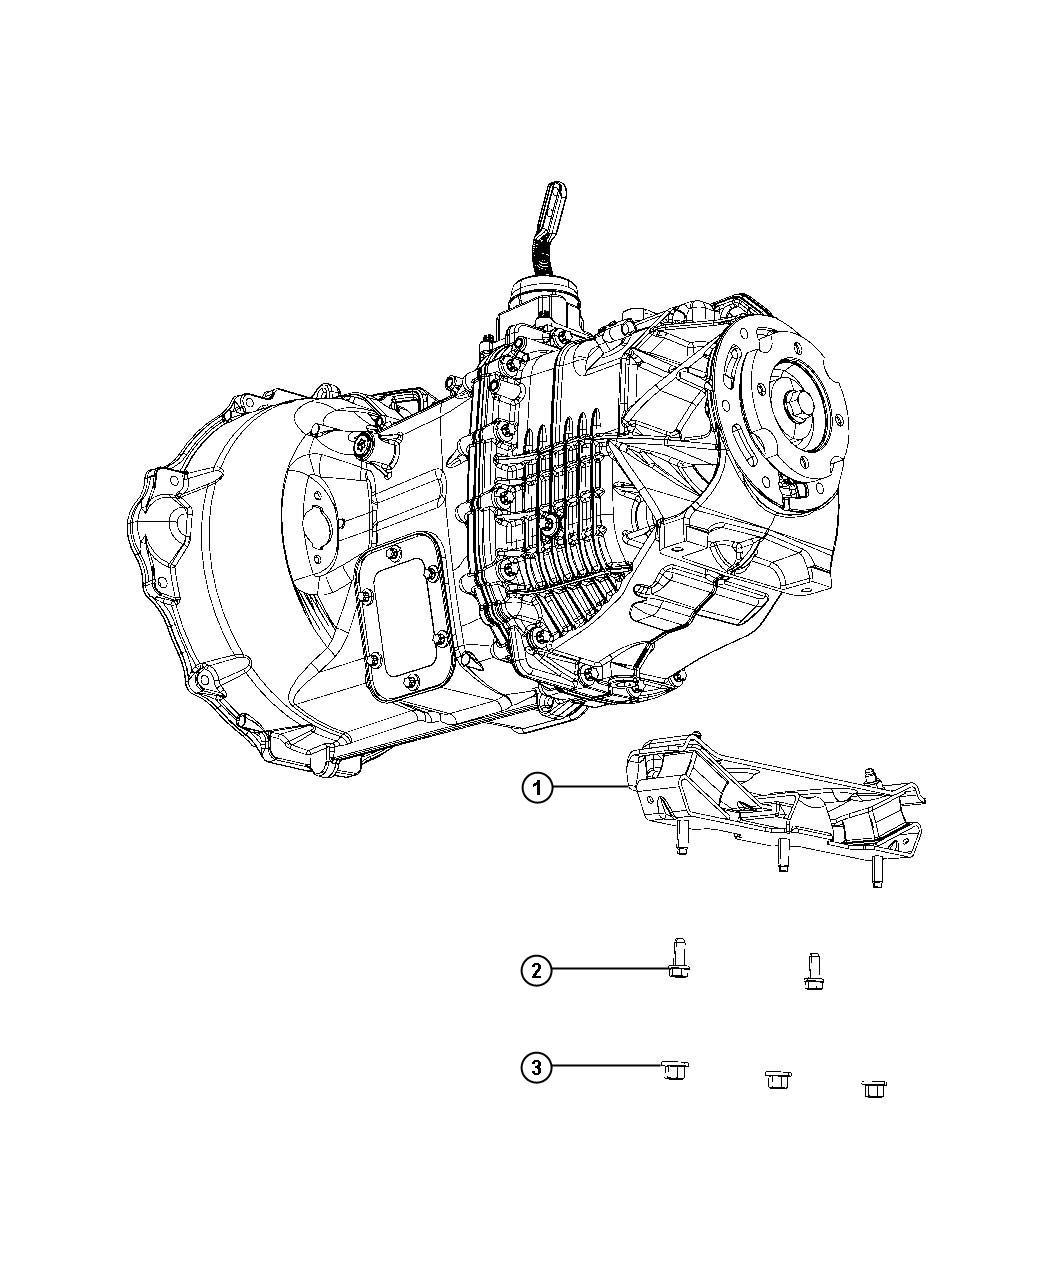 Dodge Ram 5500 Bolt. Hex head. M10x1.50x28. Mounting